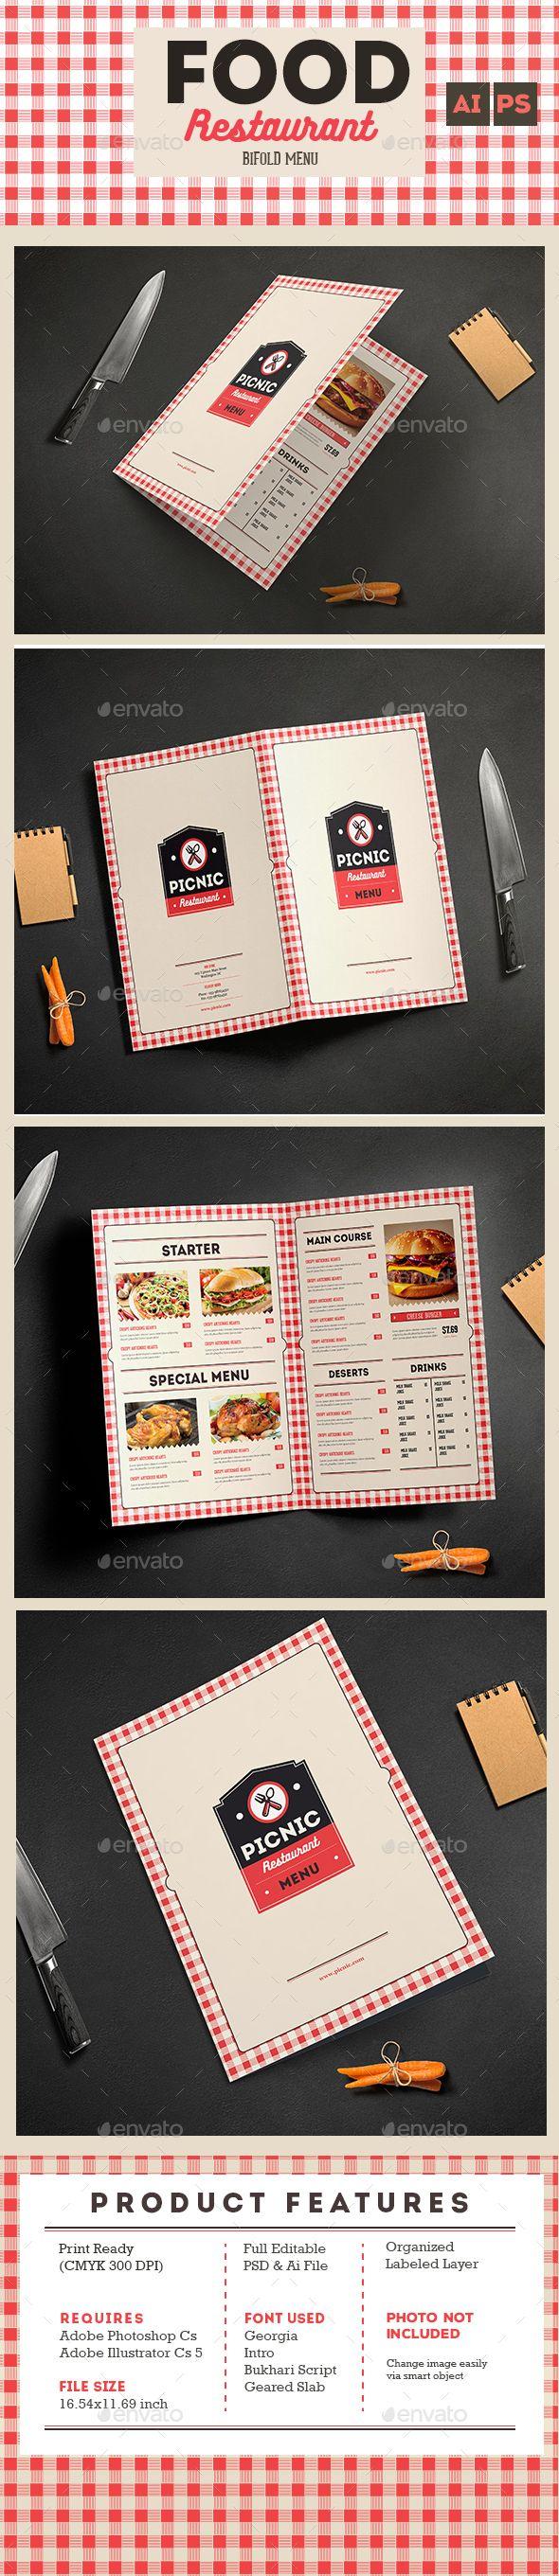 Retro Picnic Bifold Menu Template PSD, AI Illustrator. Download here: http://graphicriver.net/item/retro-picnic-bifold-menu/15994475?ref=ksioks